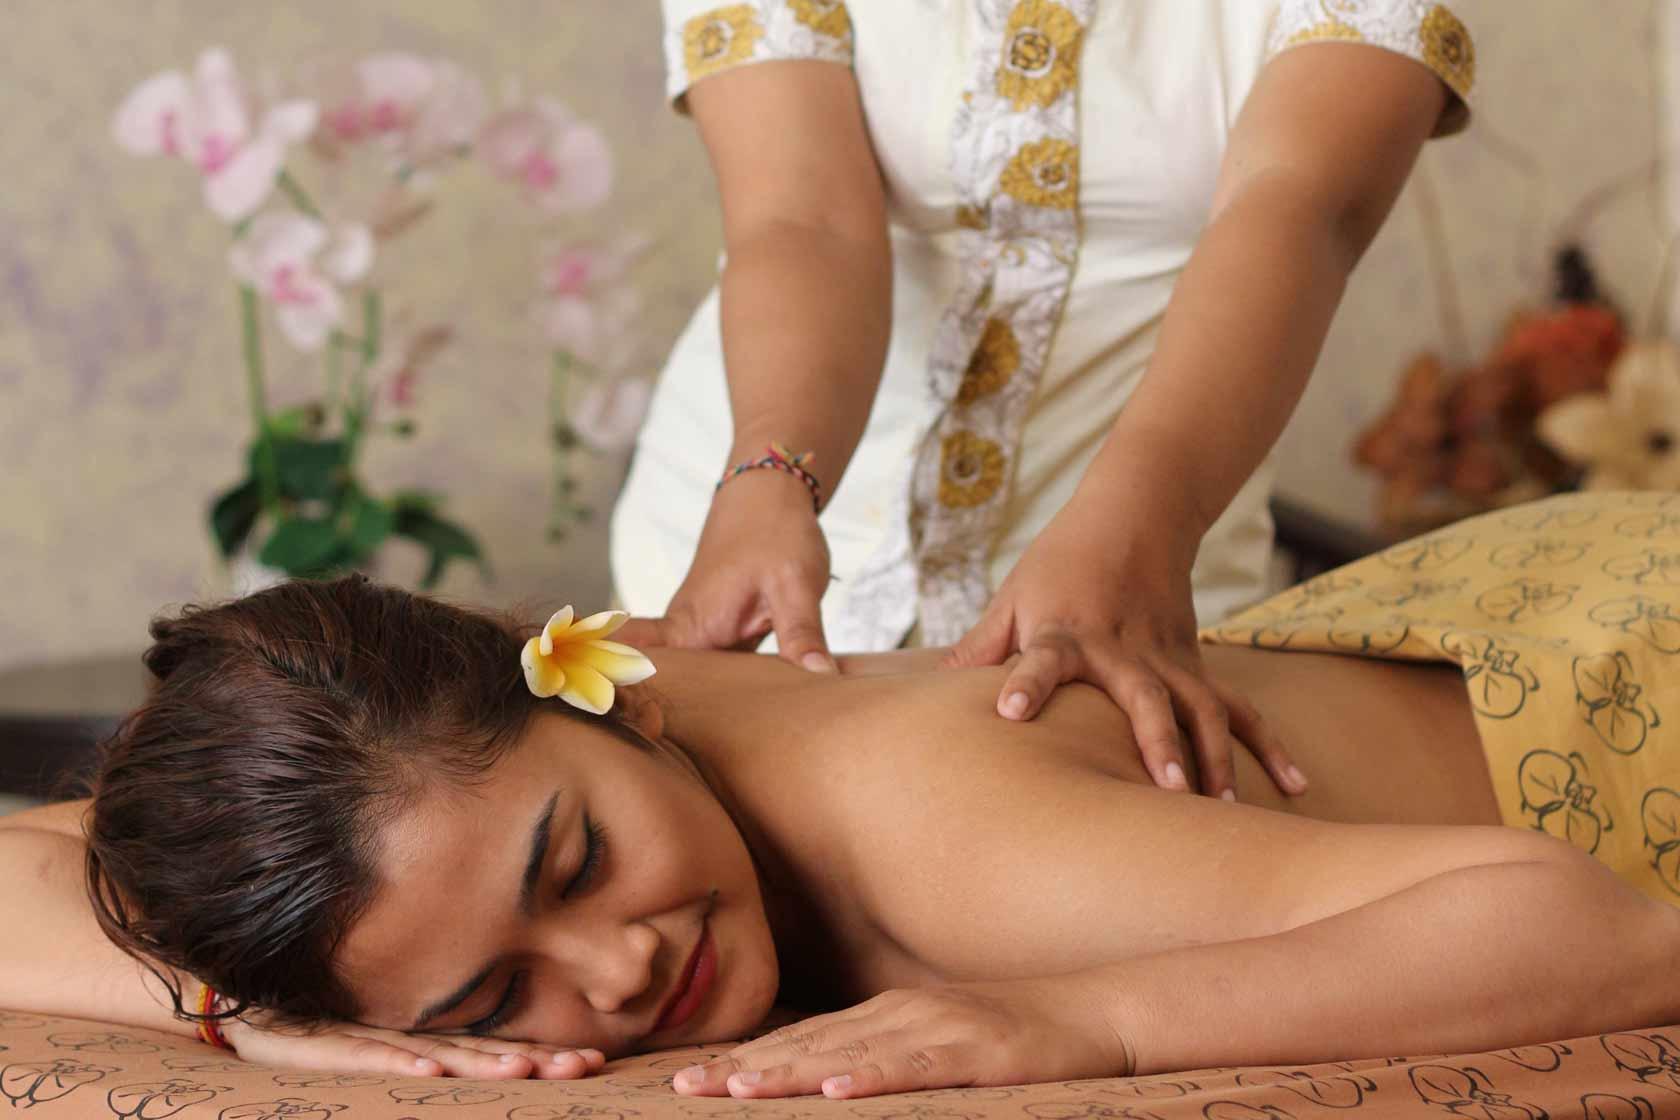 Lynphatic Massage